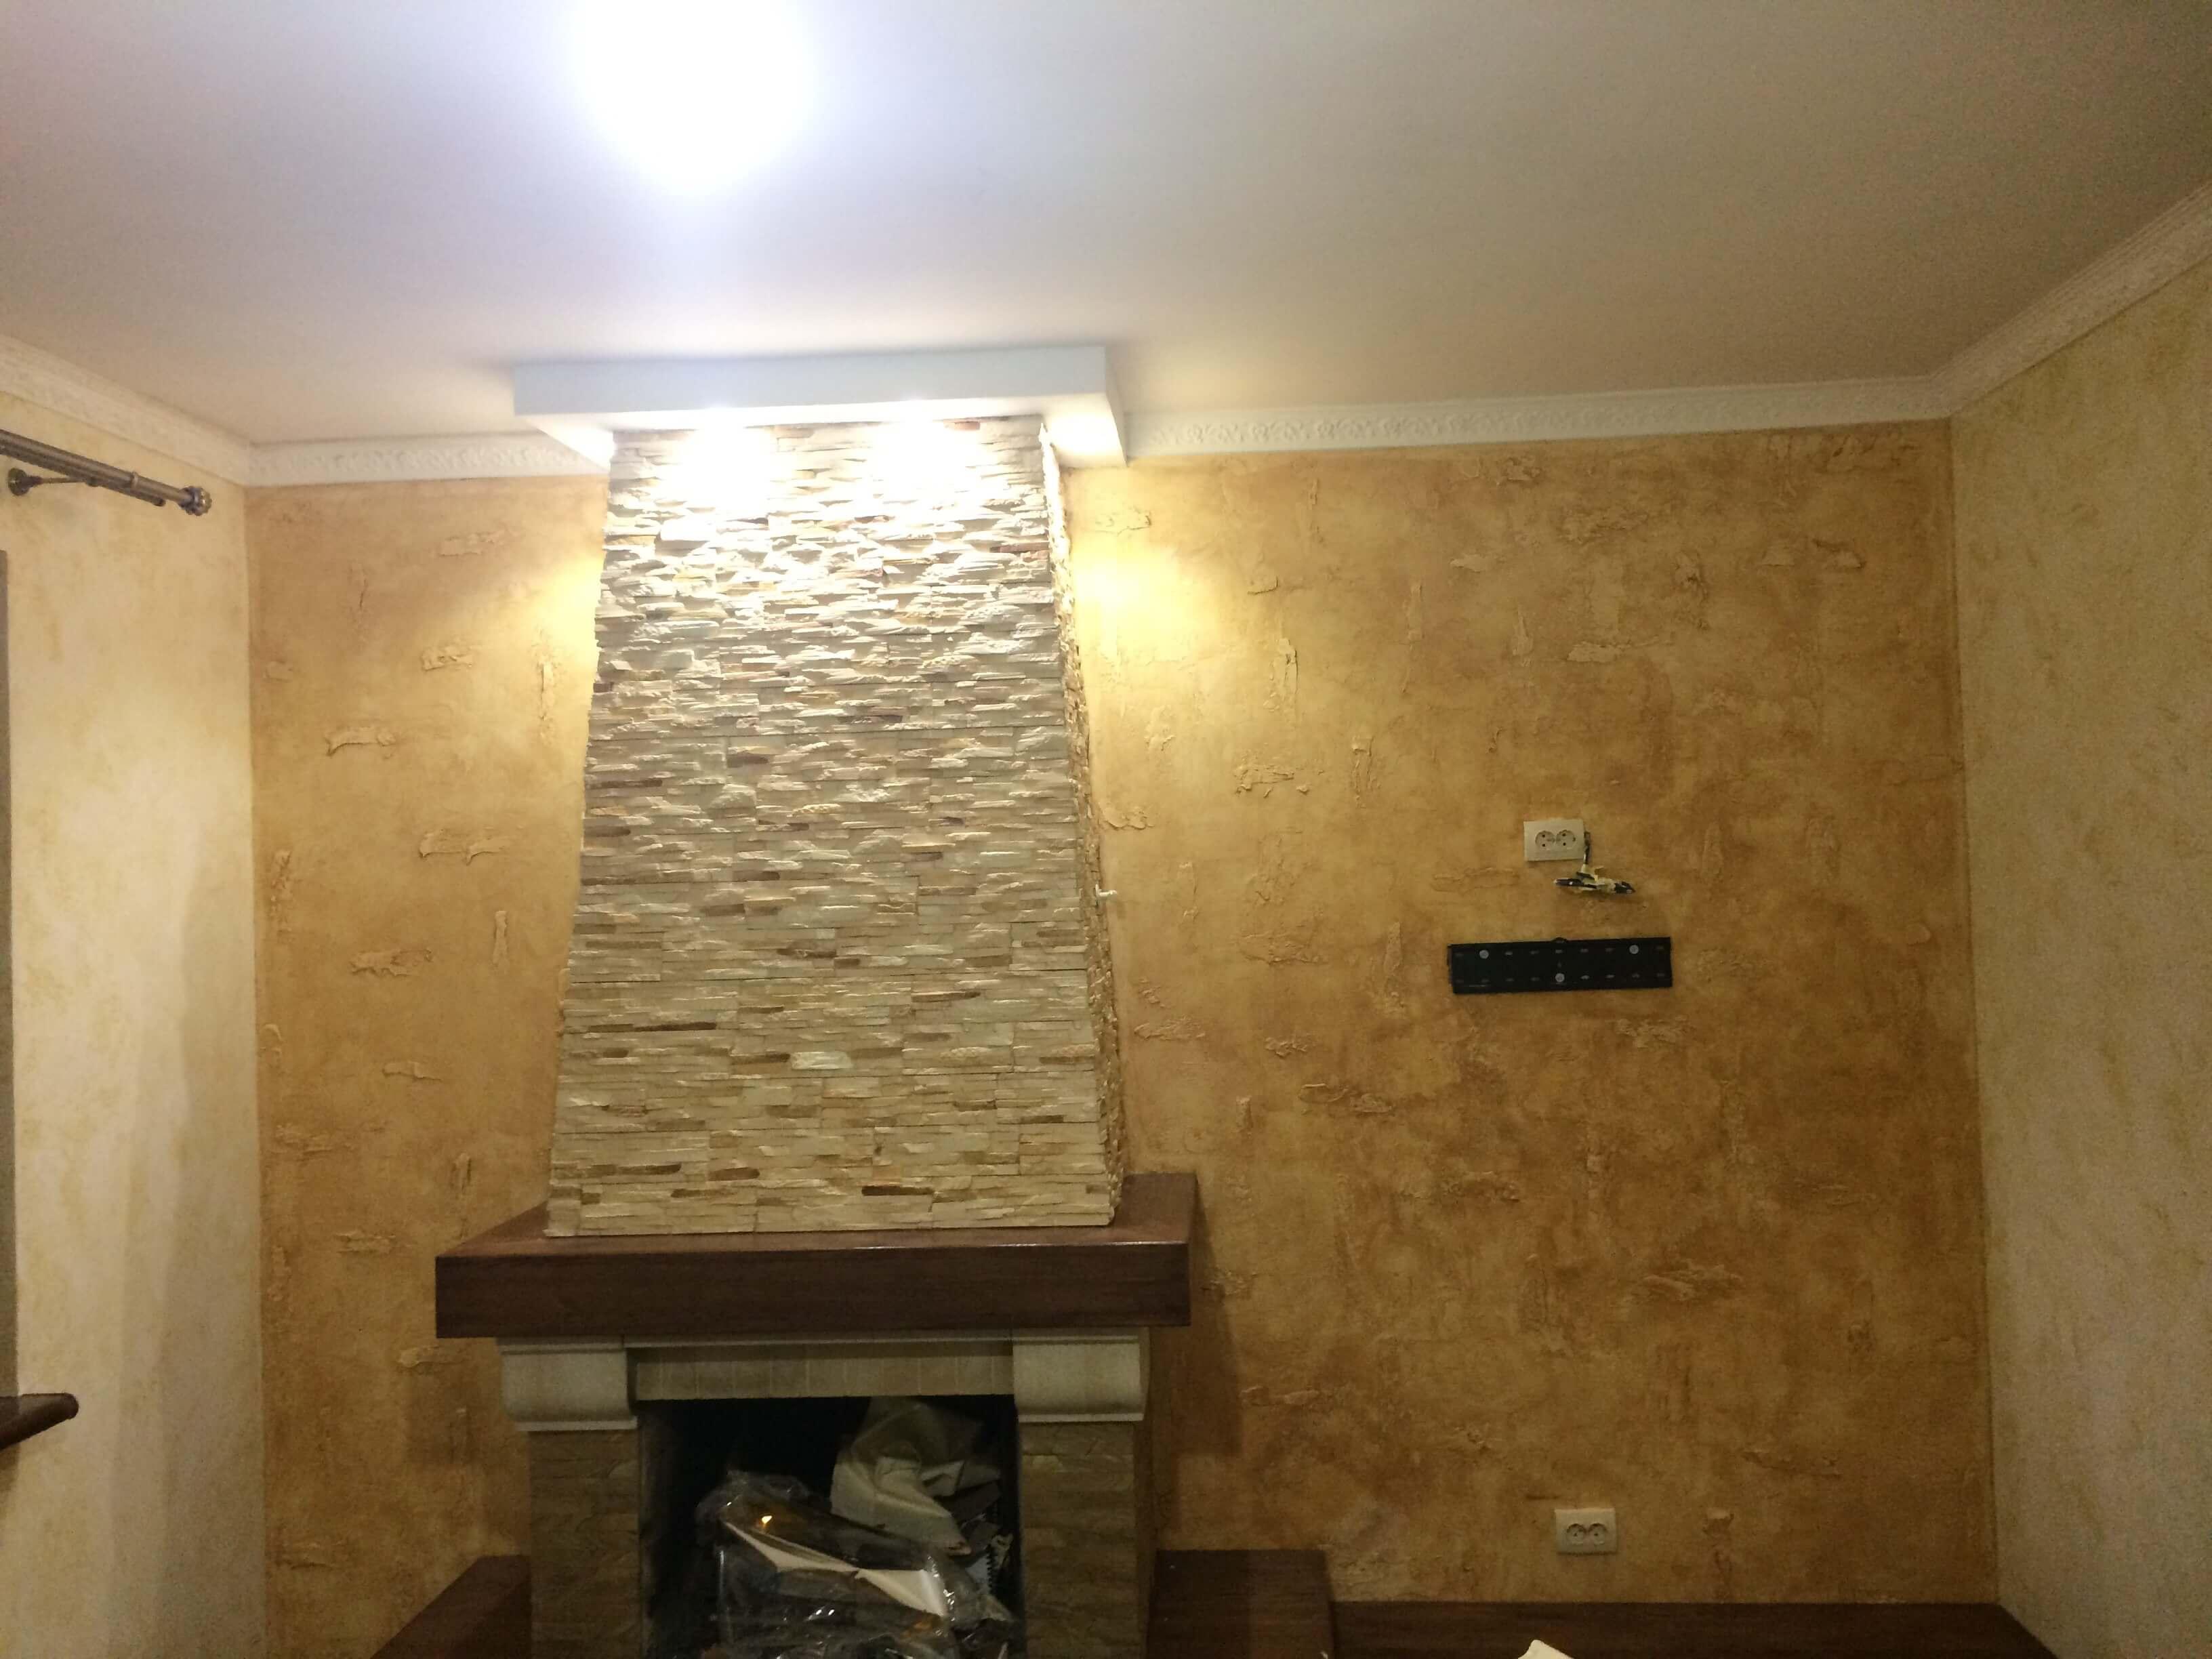 Каминный зал. Старые стены